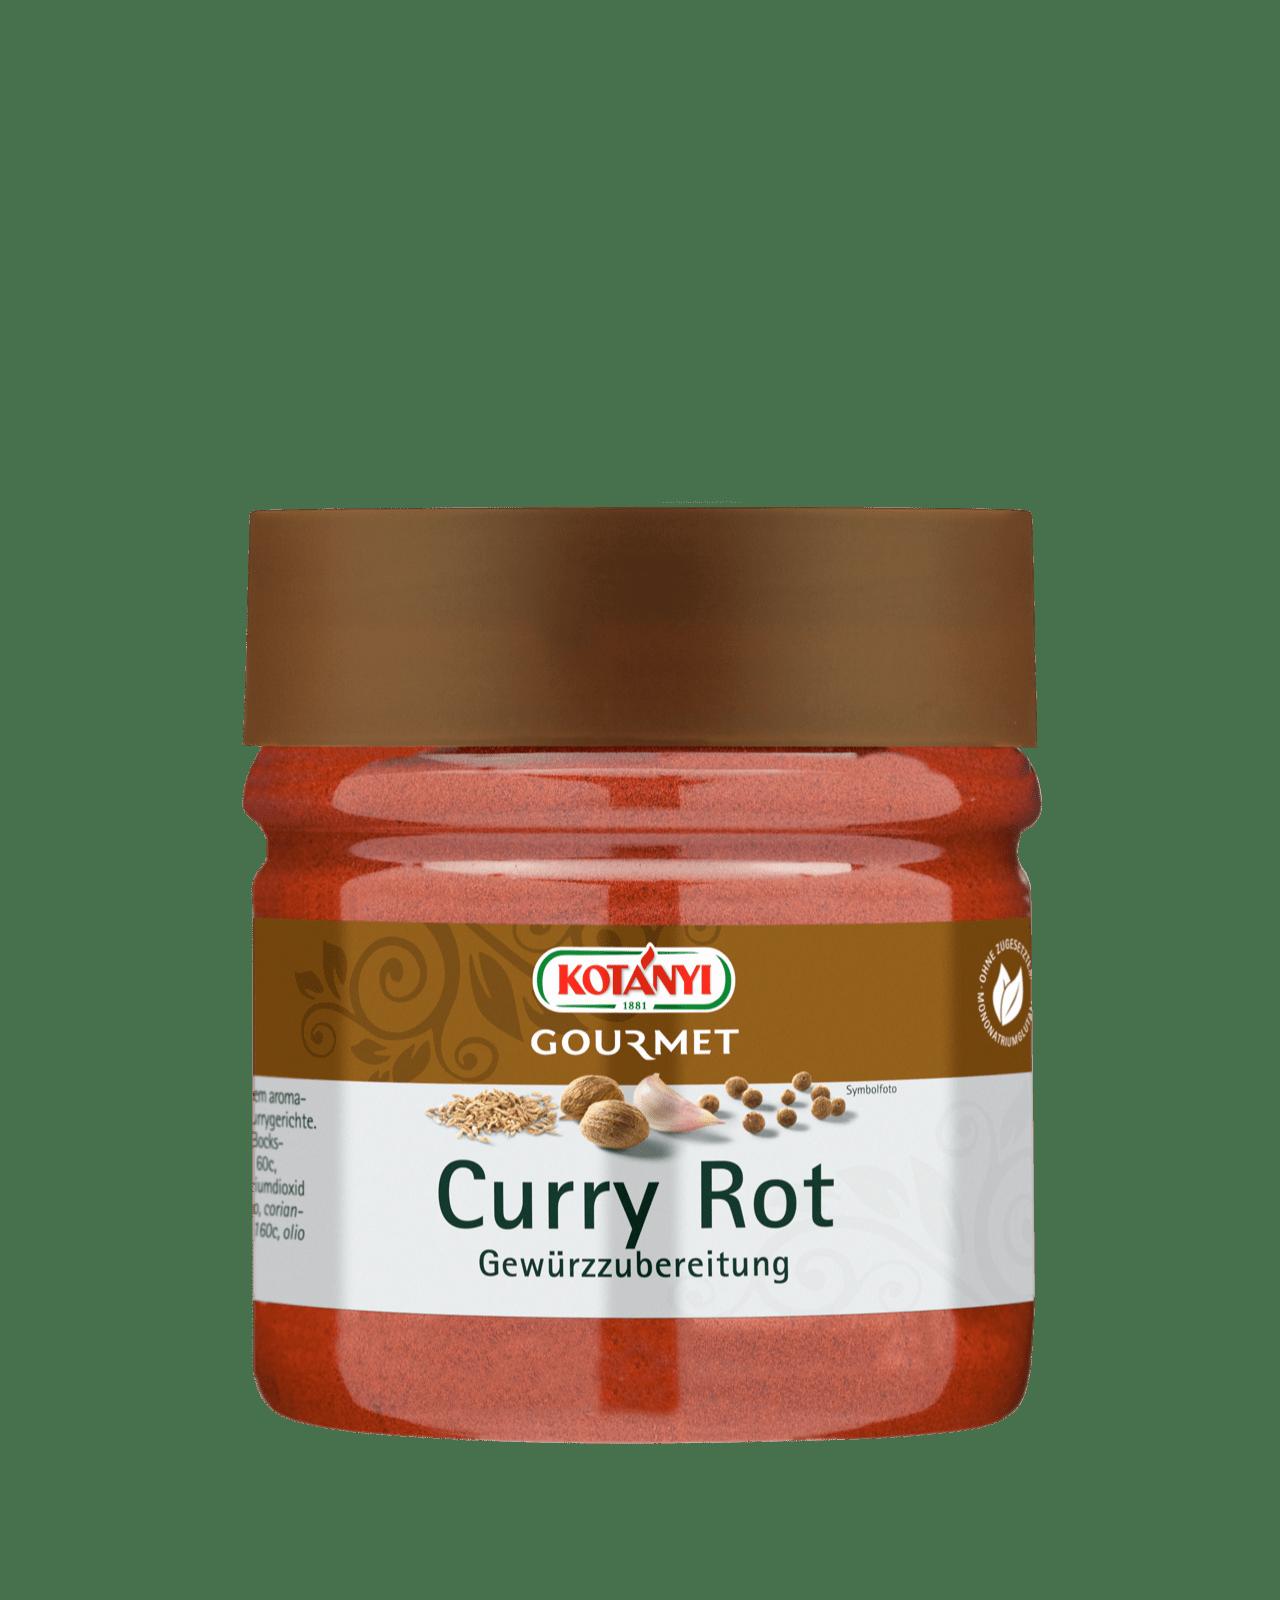 Kotányi Gourmet Curry Rot Gewürzzubereitung in der 400ccm Dose